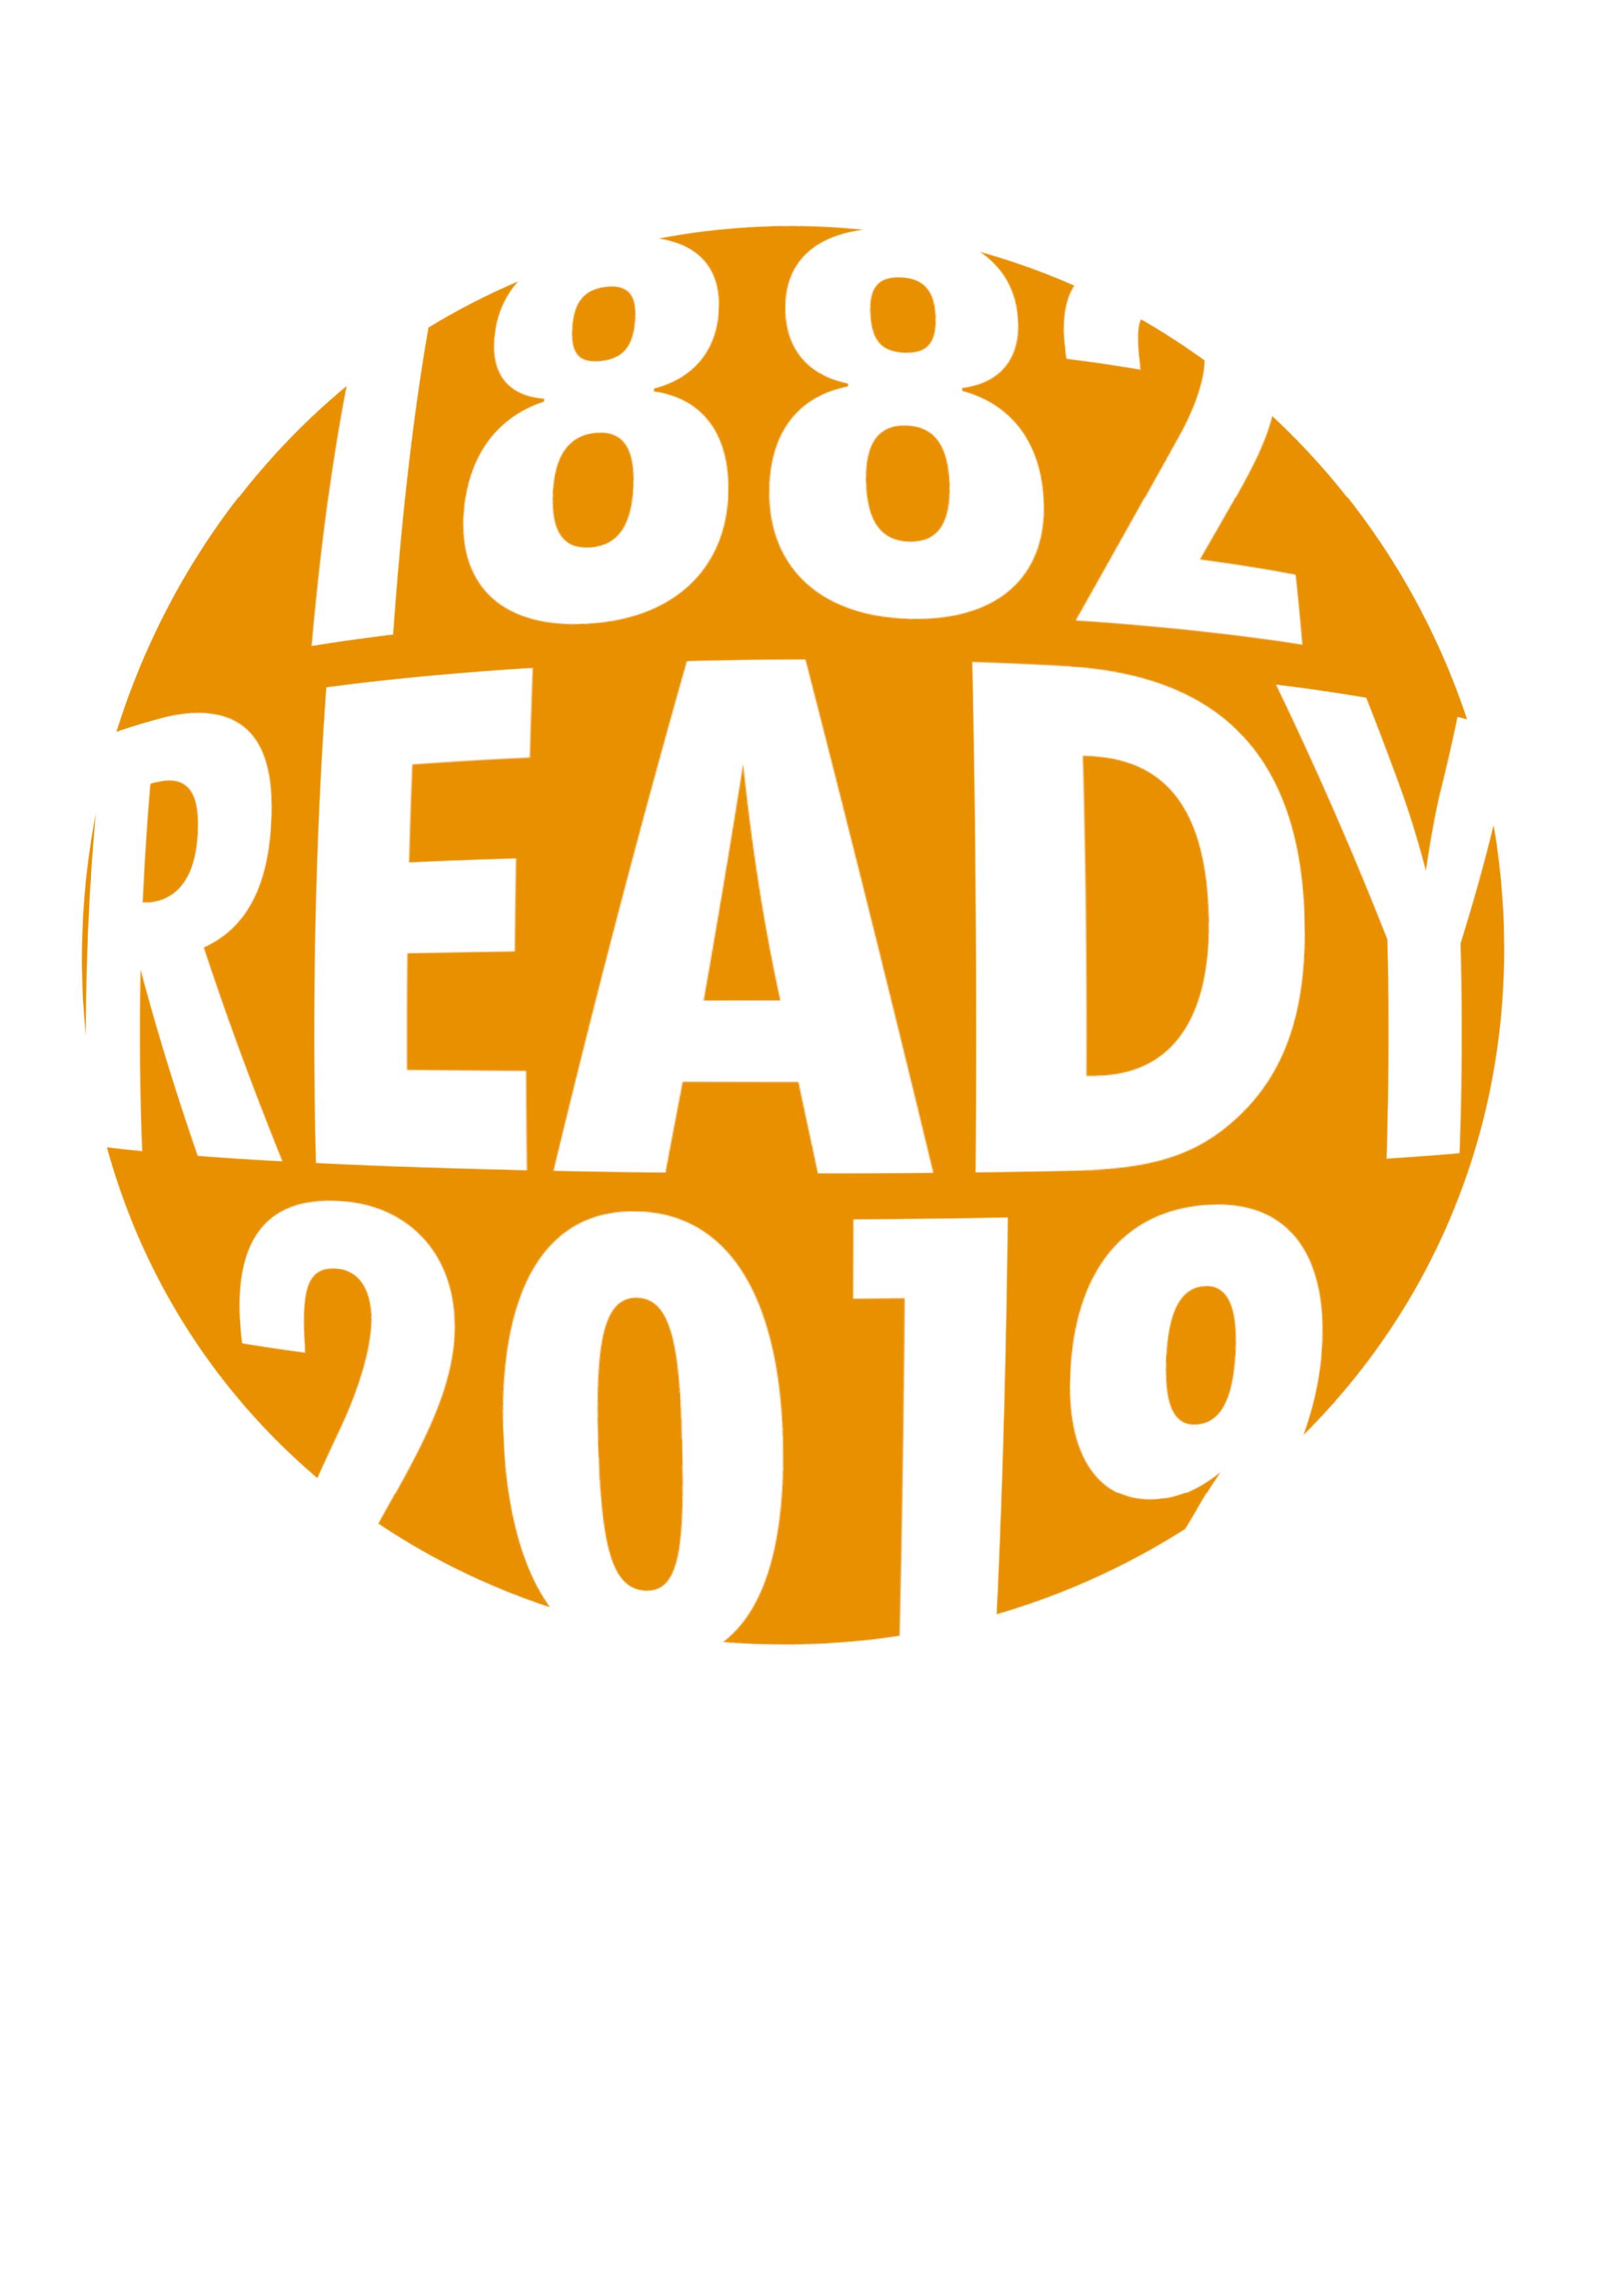 Ready 1882